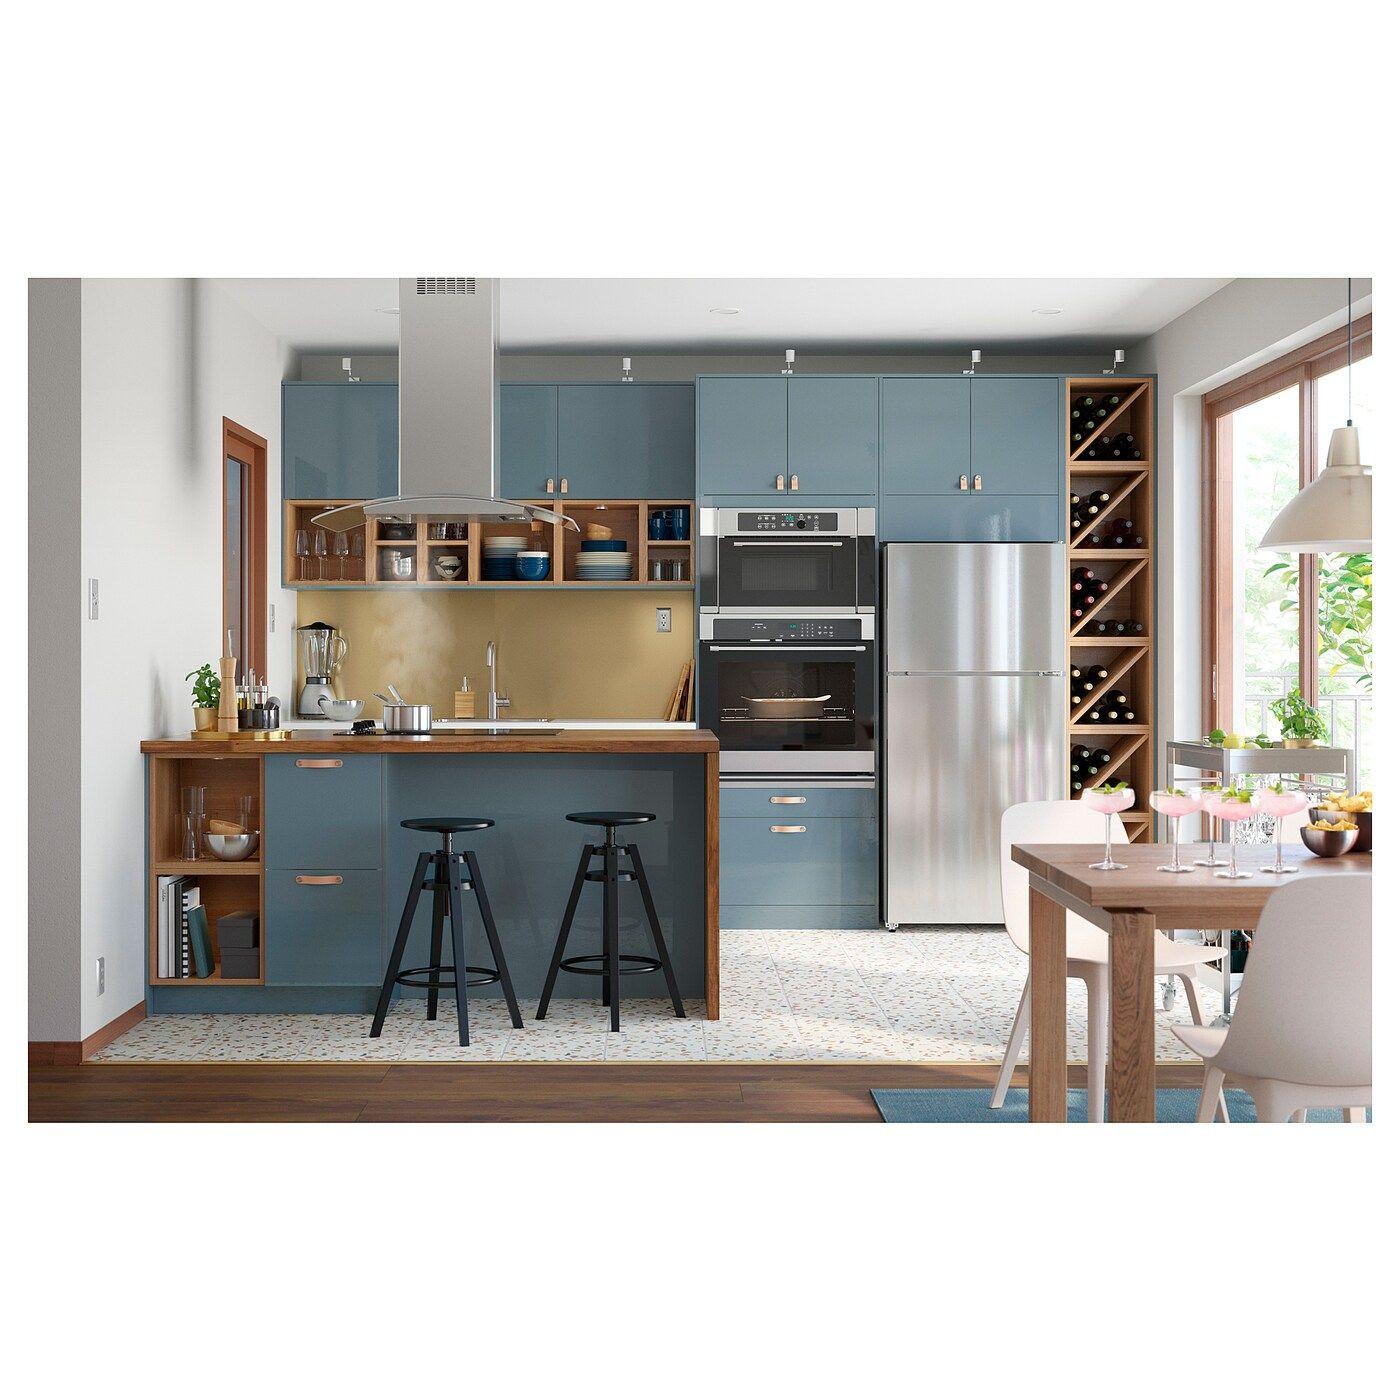 Ikea Karlby Countertop For Kitchen Island Walnut Veneer In 2020